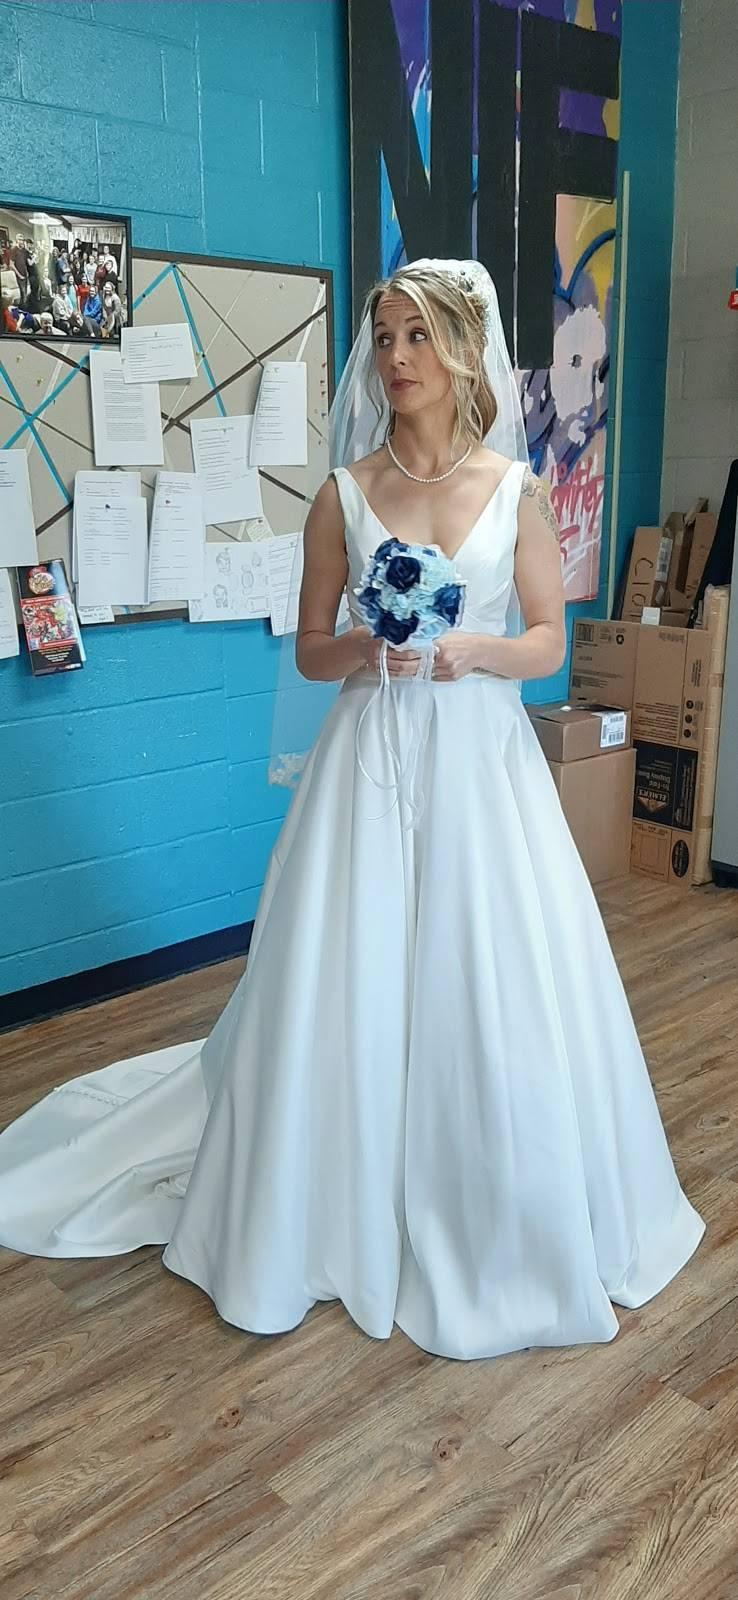 Breathless Bridal - clothing store    Photo 6 of 6   Address: 1741 US-41, Ridgetop, TN 37152, USA   Phone: (615) 855-0644